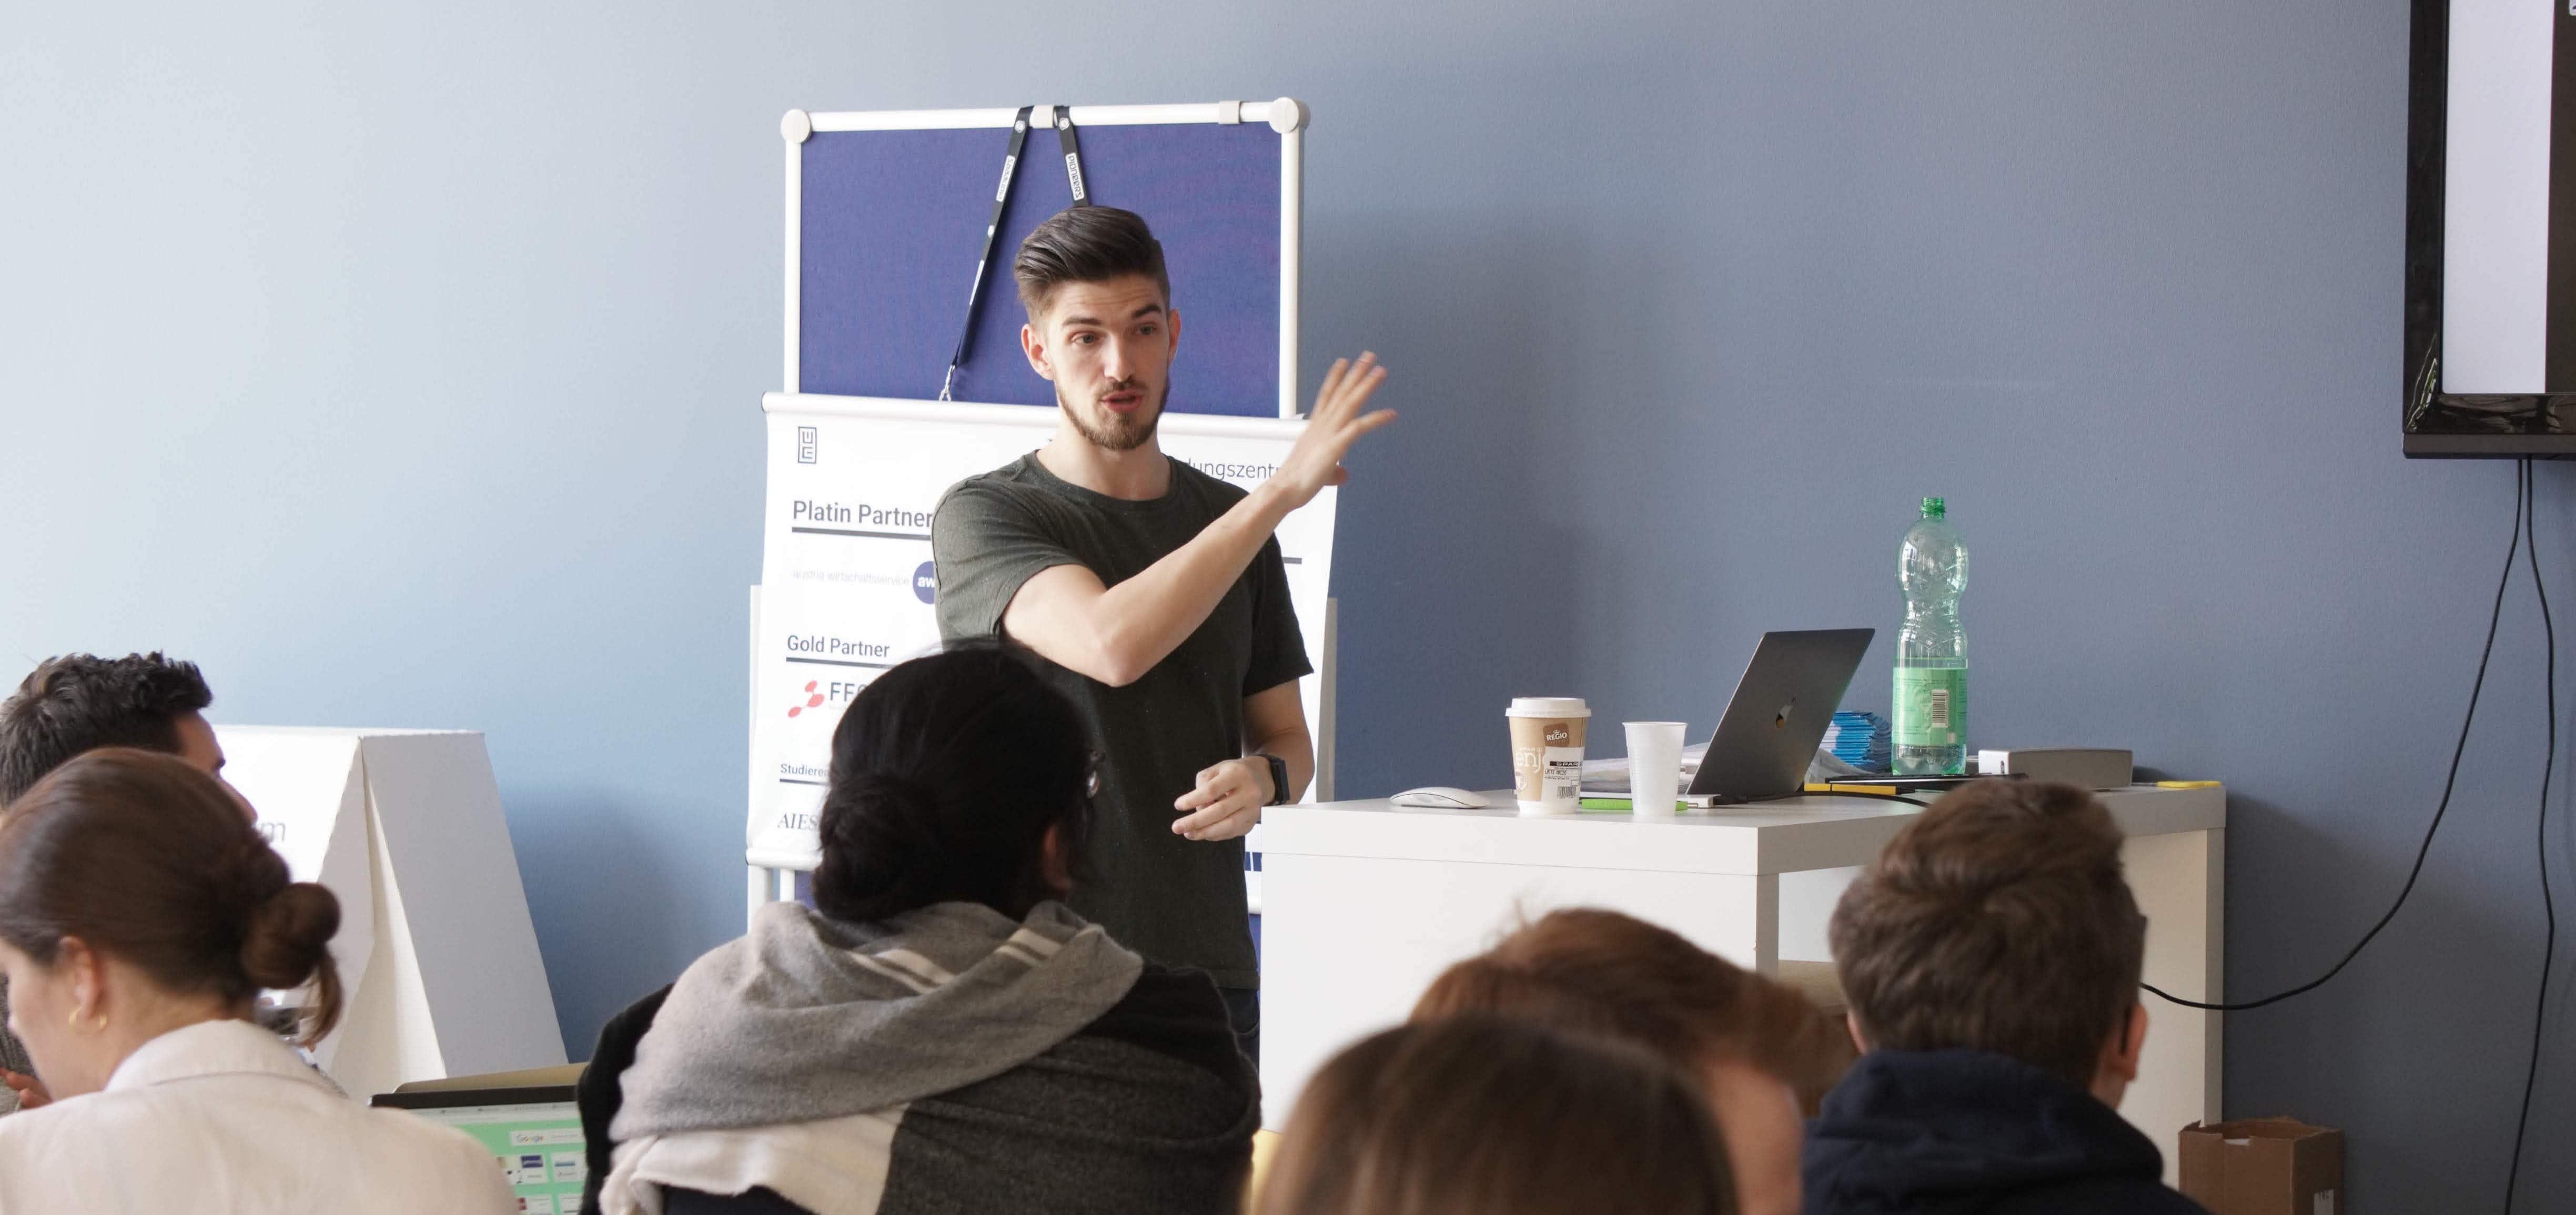 Karl teaching students